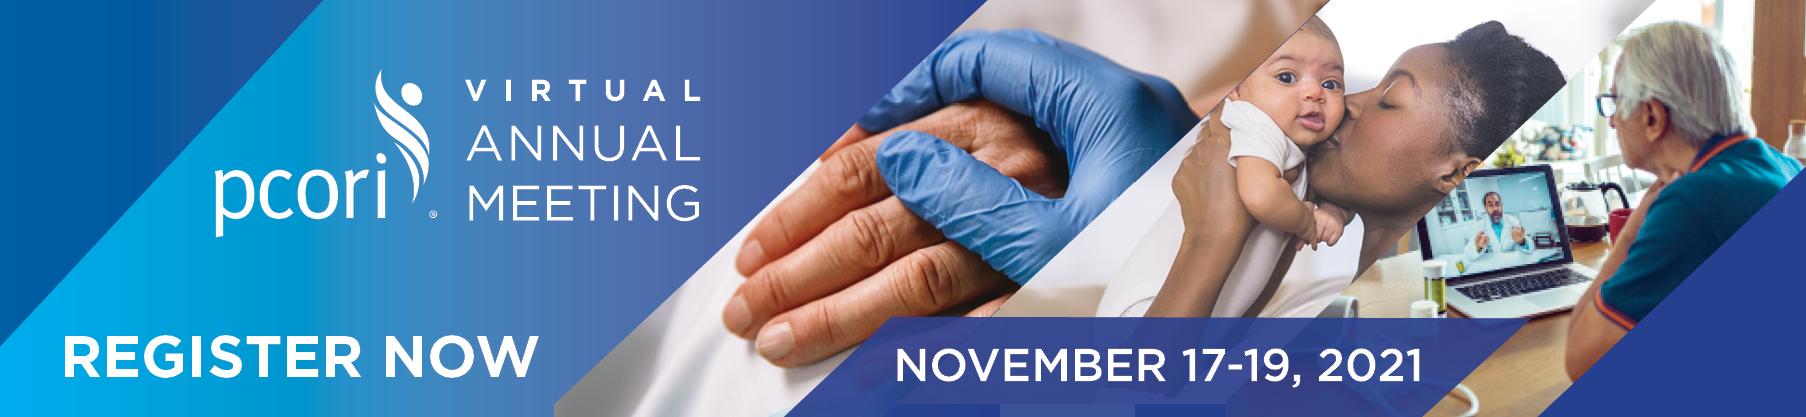 2021 PCORI Virtual Annual Meeting - Wednesday, November 17, 2021 to Friday, November 19, 2021. Register now.